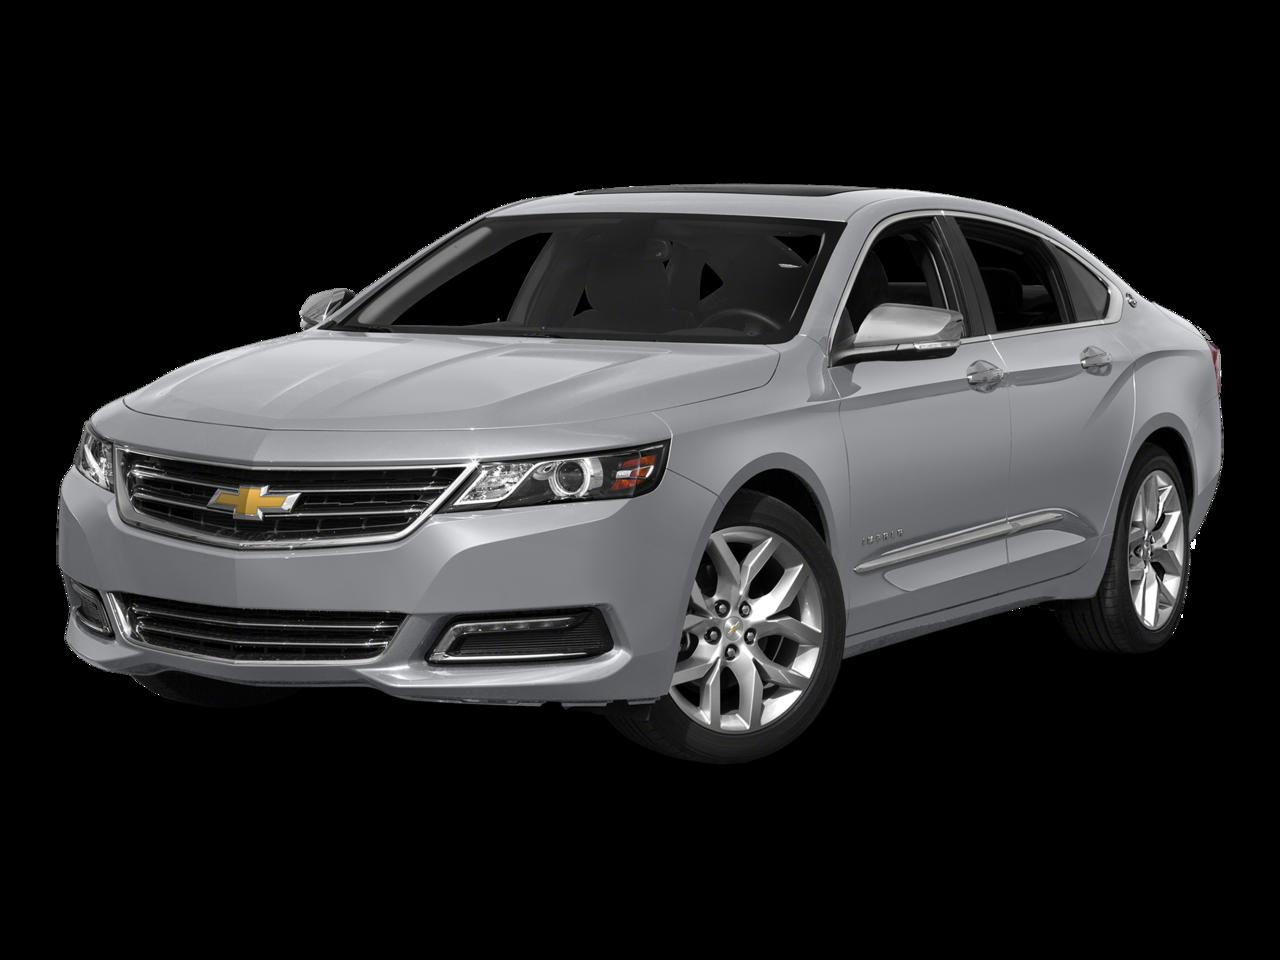 2015 Buick Lacrosse Vs 2015 Chevy Impala Chevrolet Impala